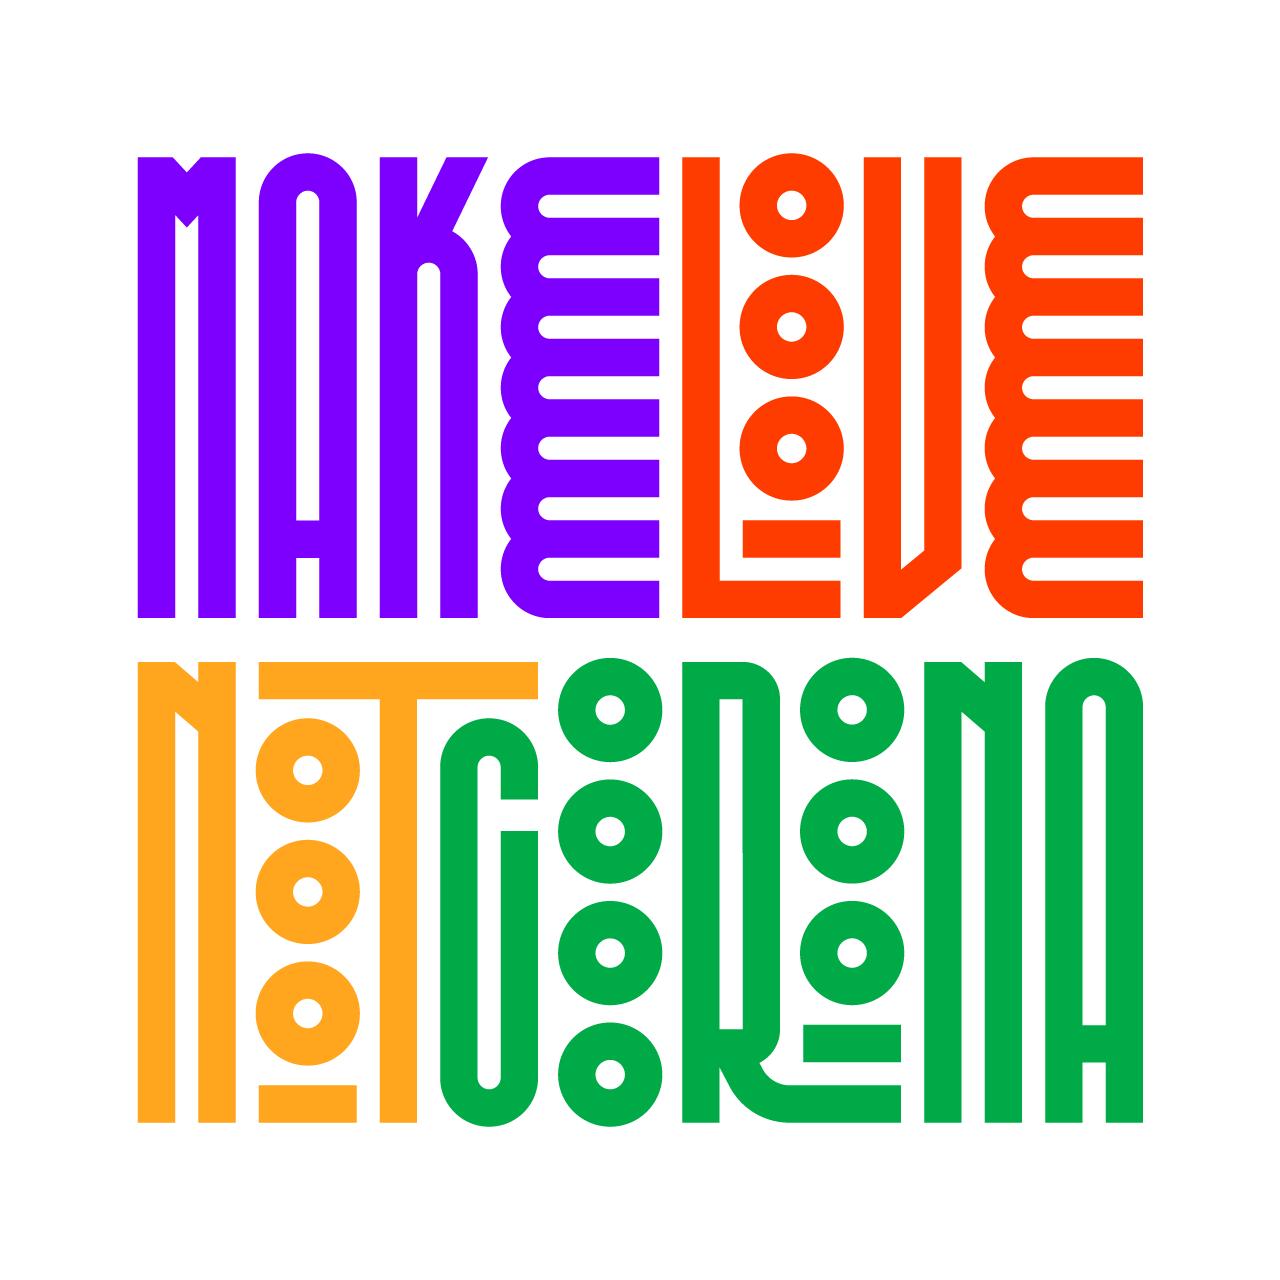 make-love-not-corona